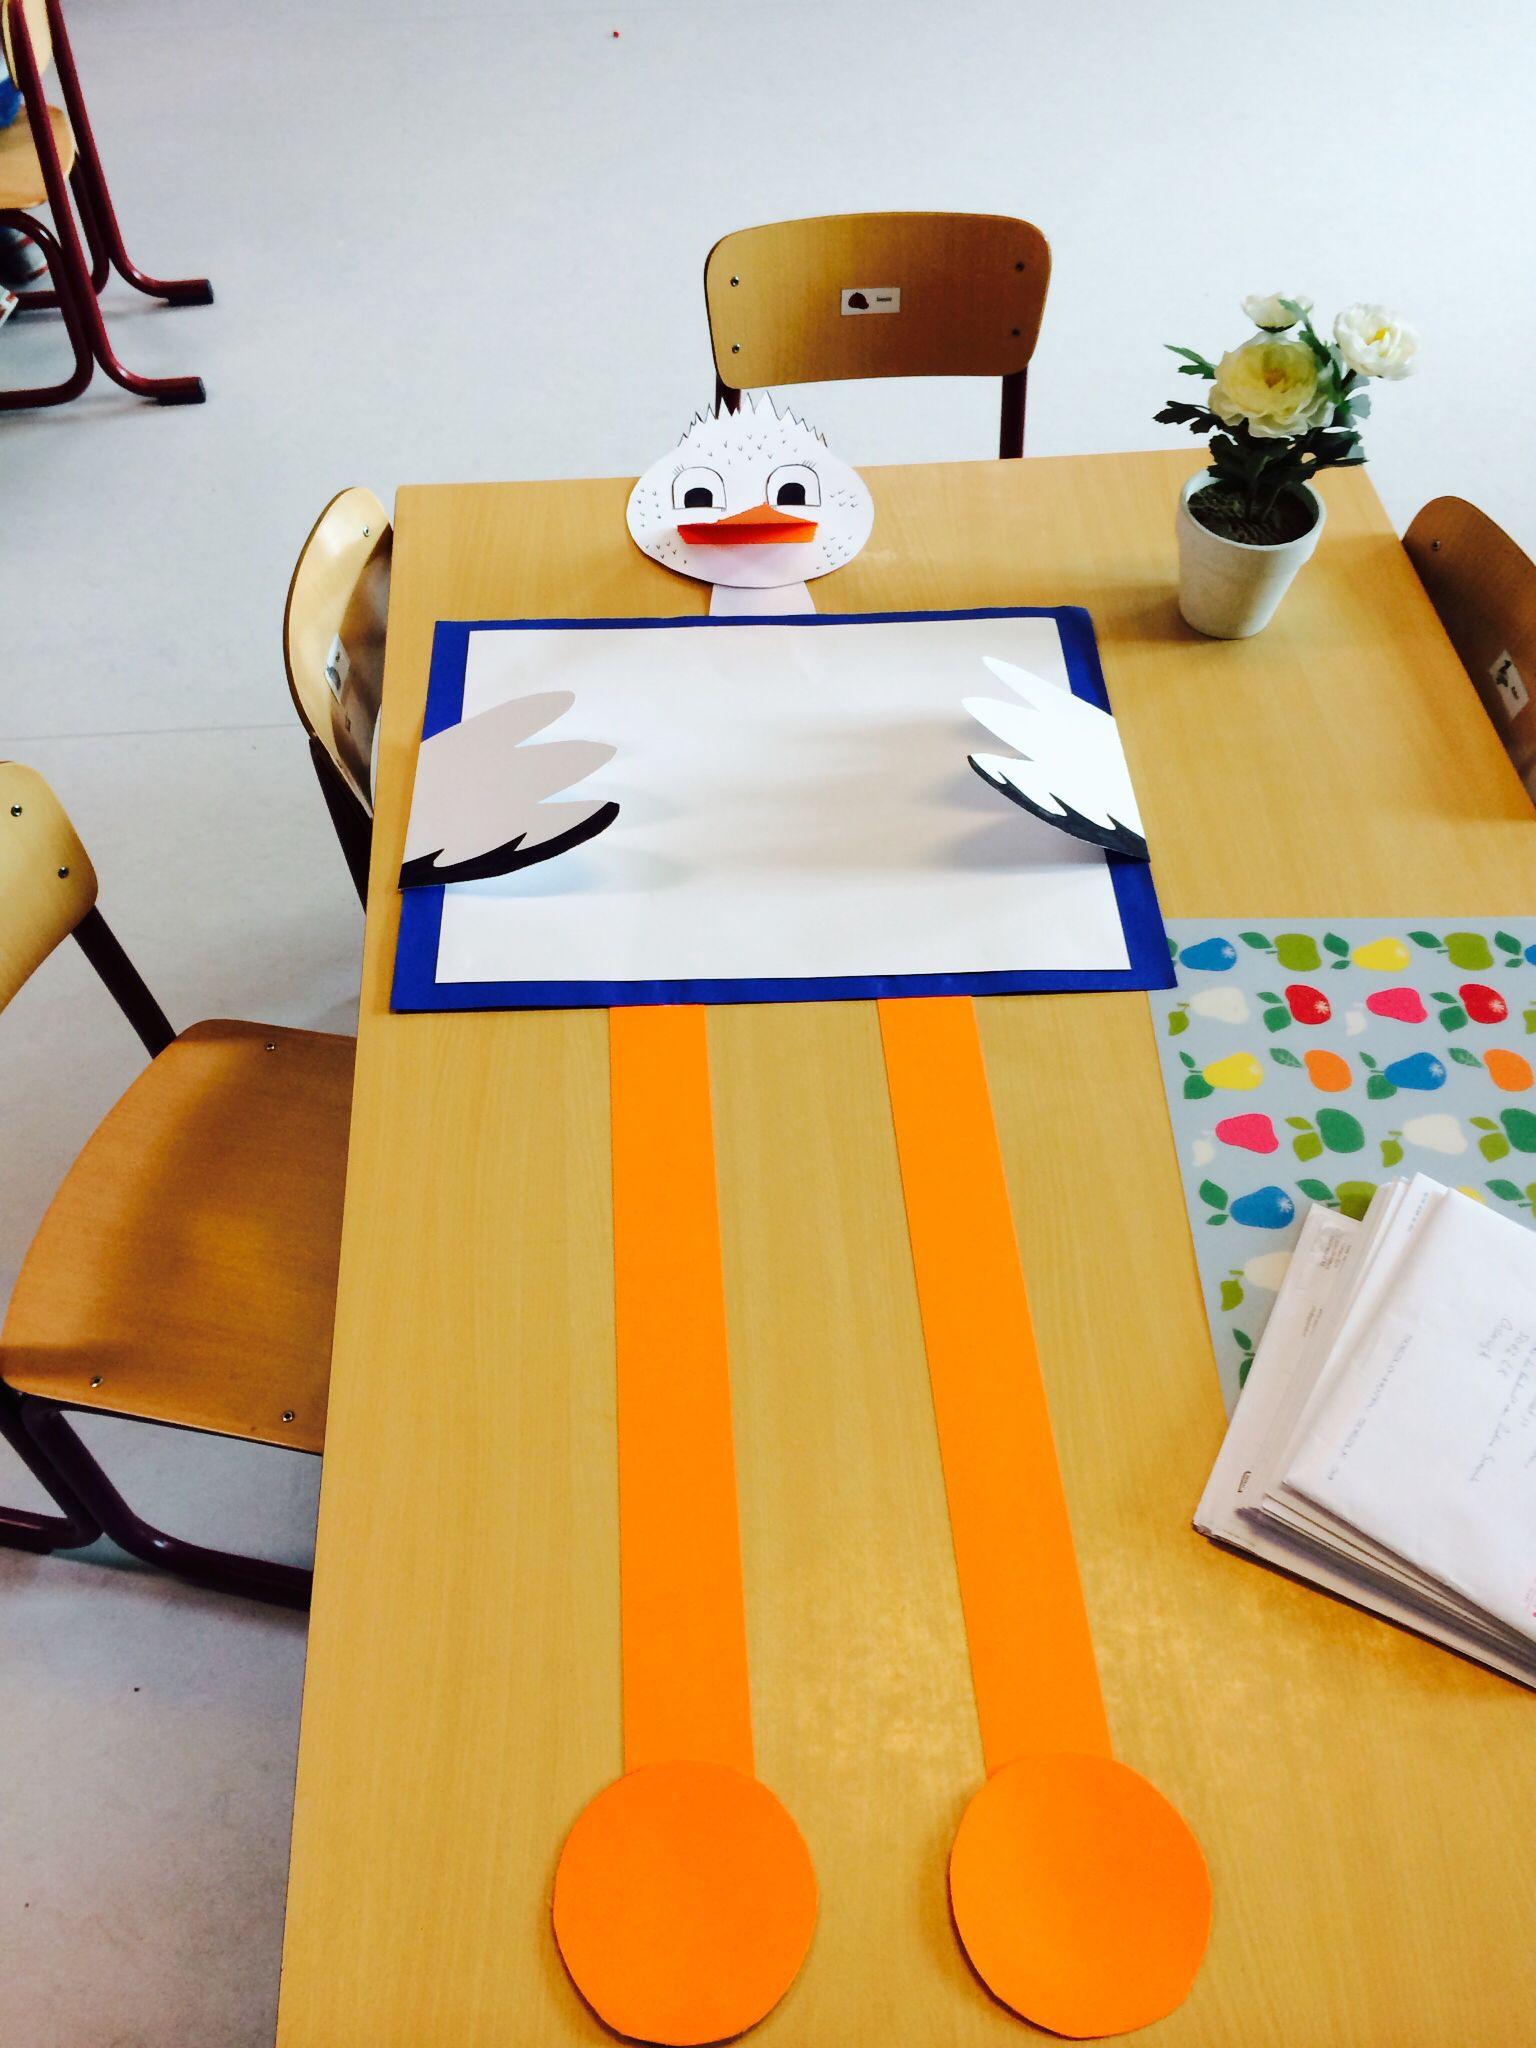 Ooievaar kraamcadeau - DIY | Pinterest - Geboorte, Zusje ...